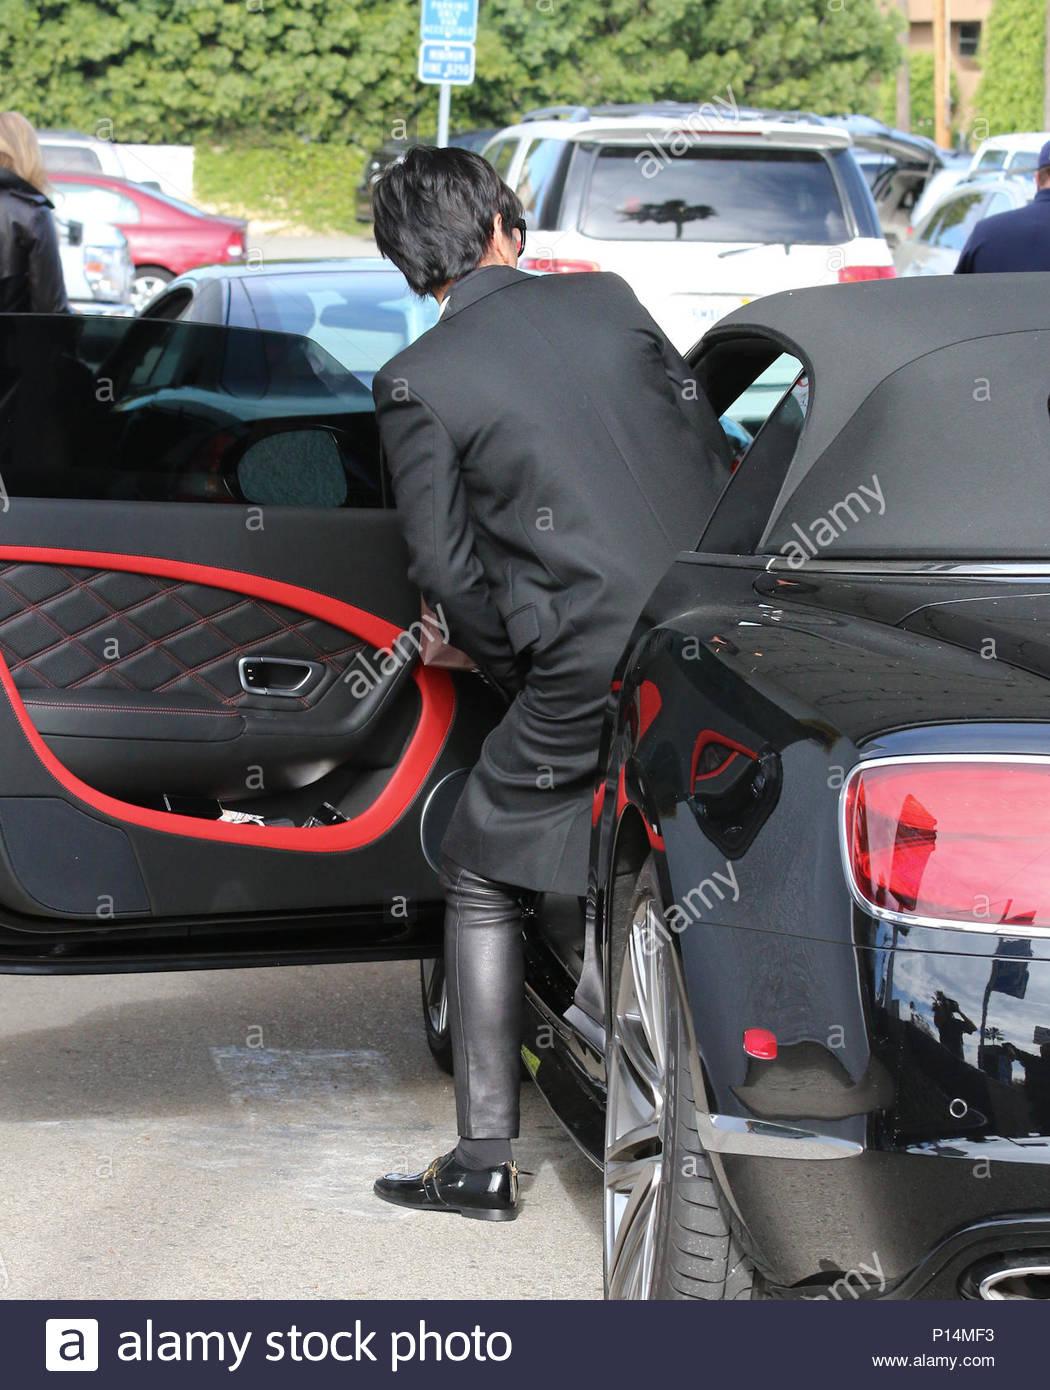 Kris Jenner Mandatory Byline To Read Infphoto Com Only Br